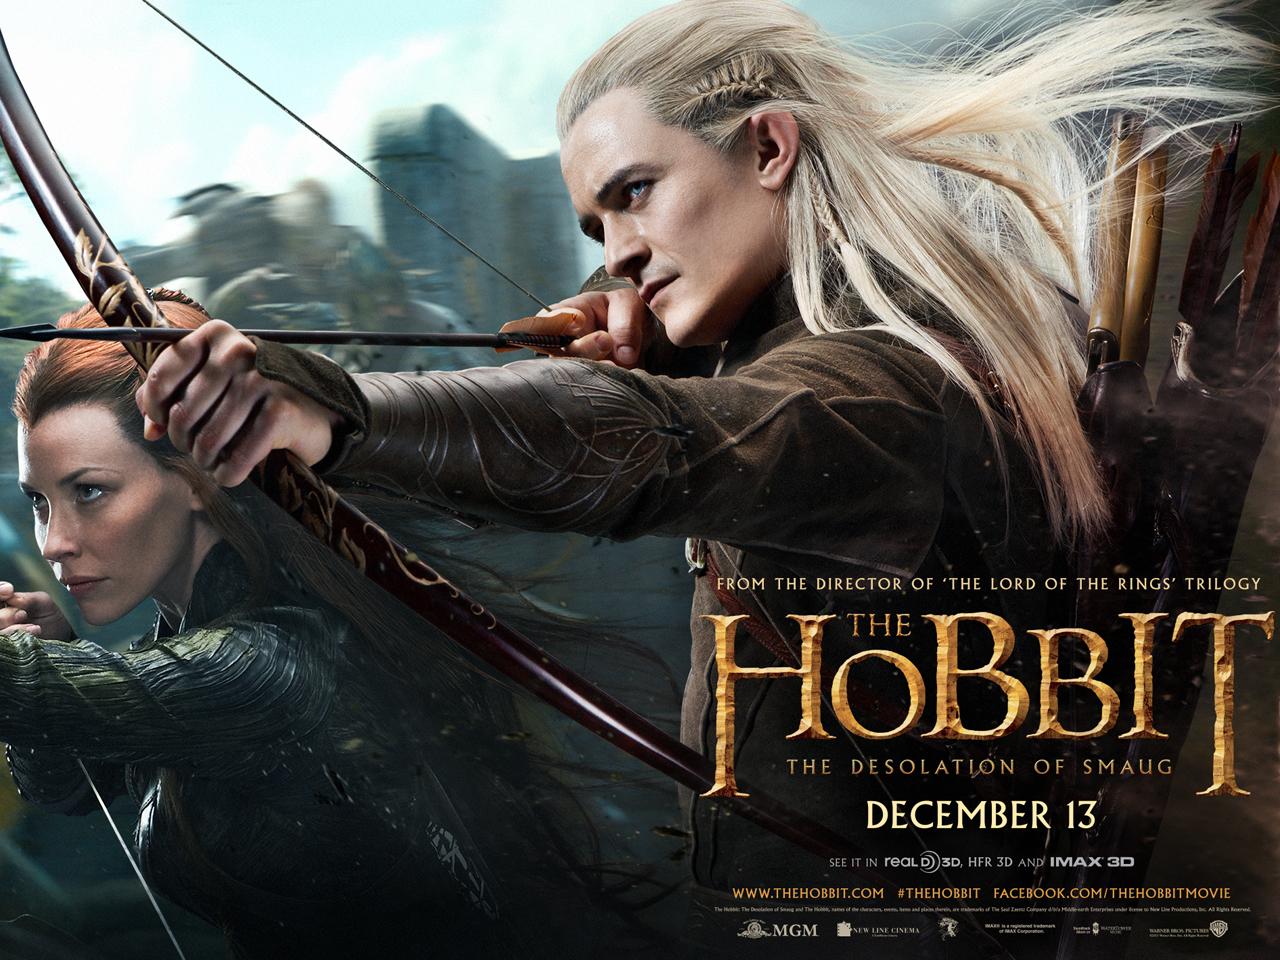 The Hobbit (film series) - Wikipedia